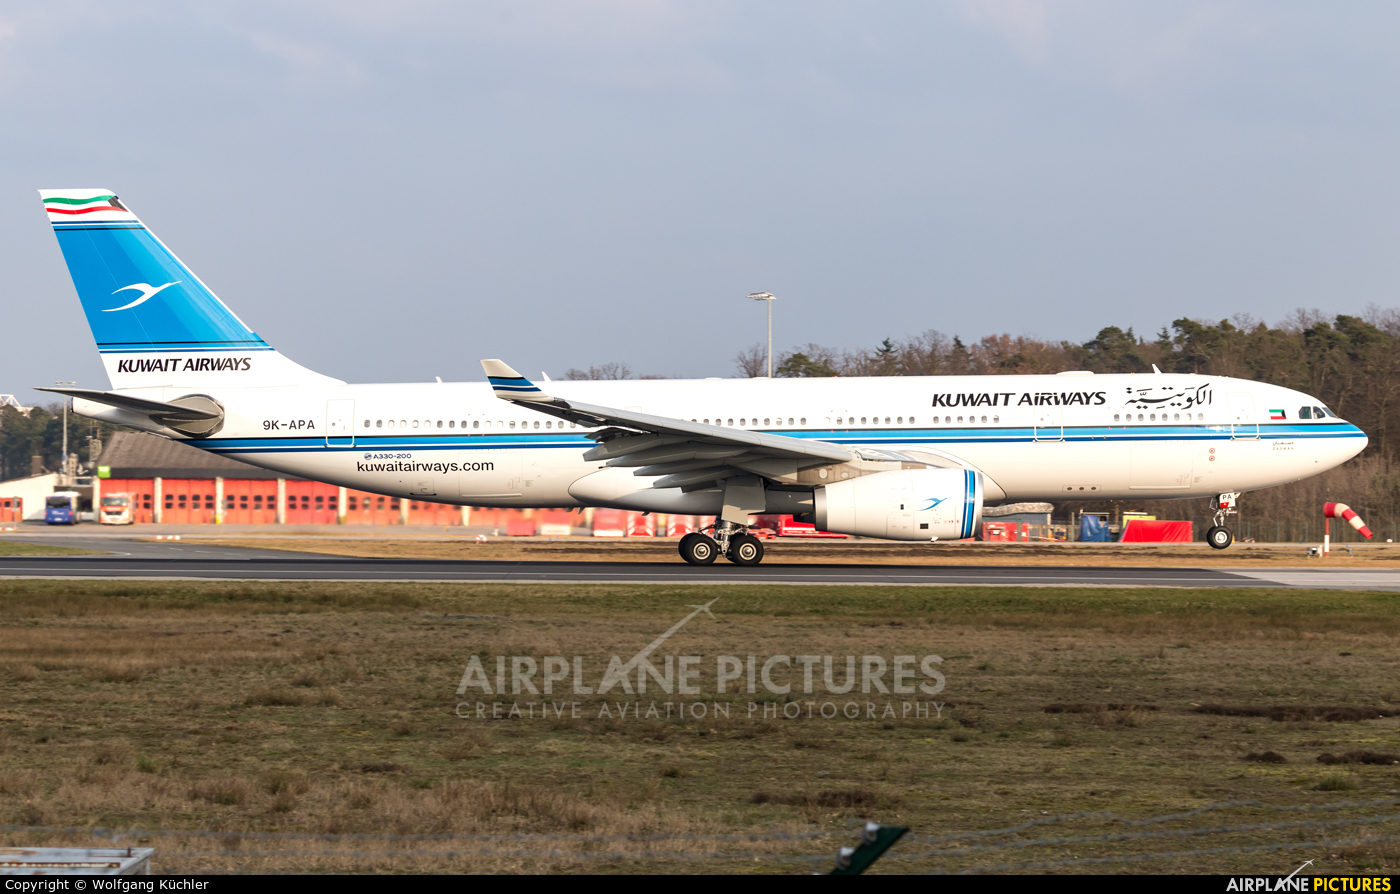 Kuwait Airways 9K-APA aircraft at Frankfurt